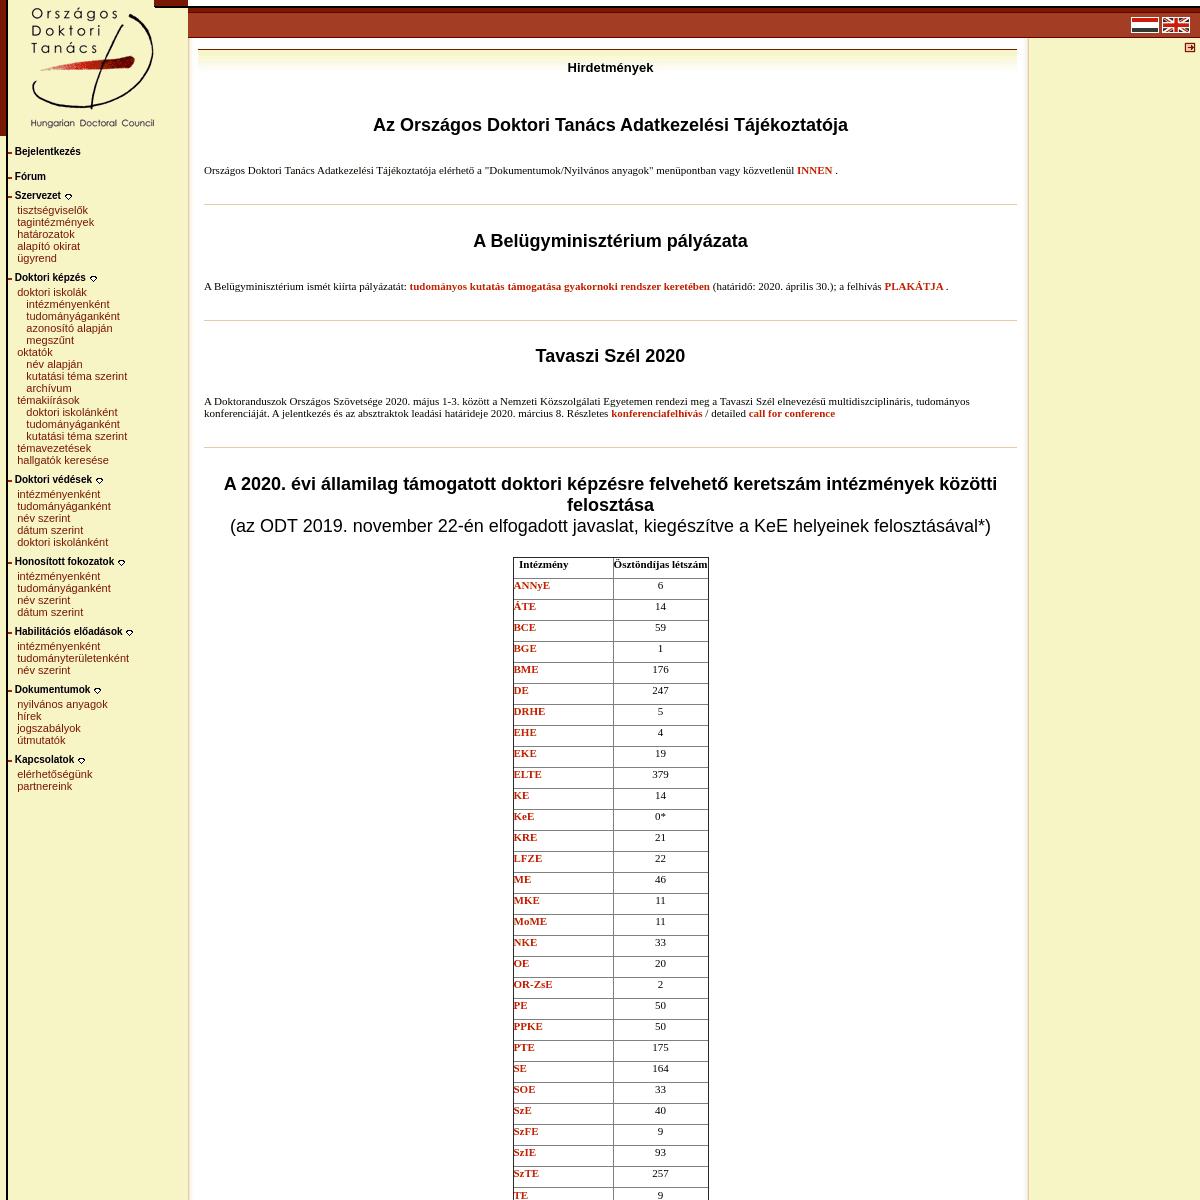 ArchiveBay.com - doktori.hu - ODT hír- 2020.02.25 Hirdetmények